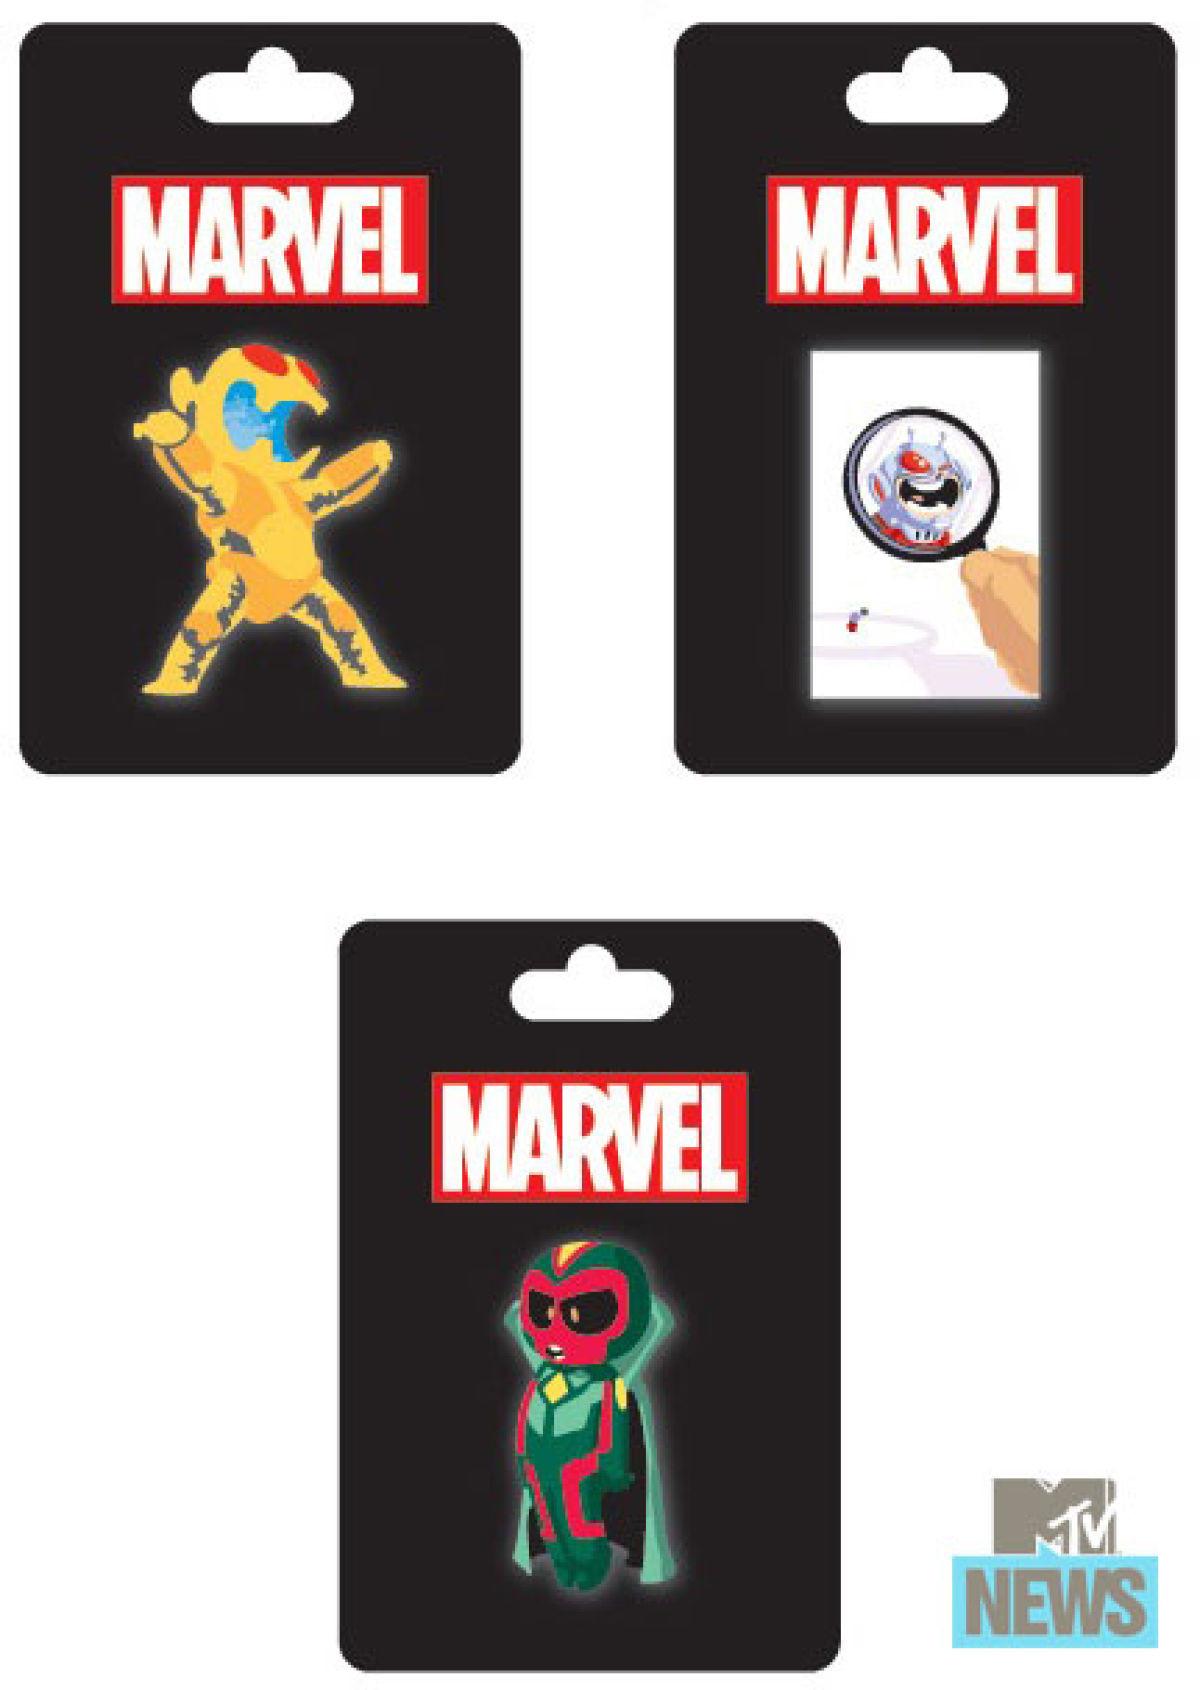 Marvel Pins  Details SDCC Exclusive Marvel Pins